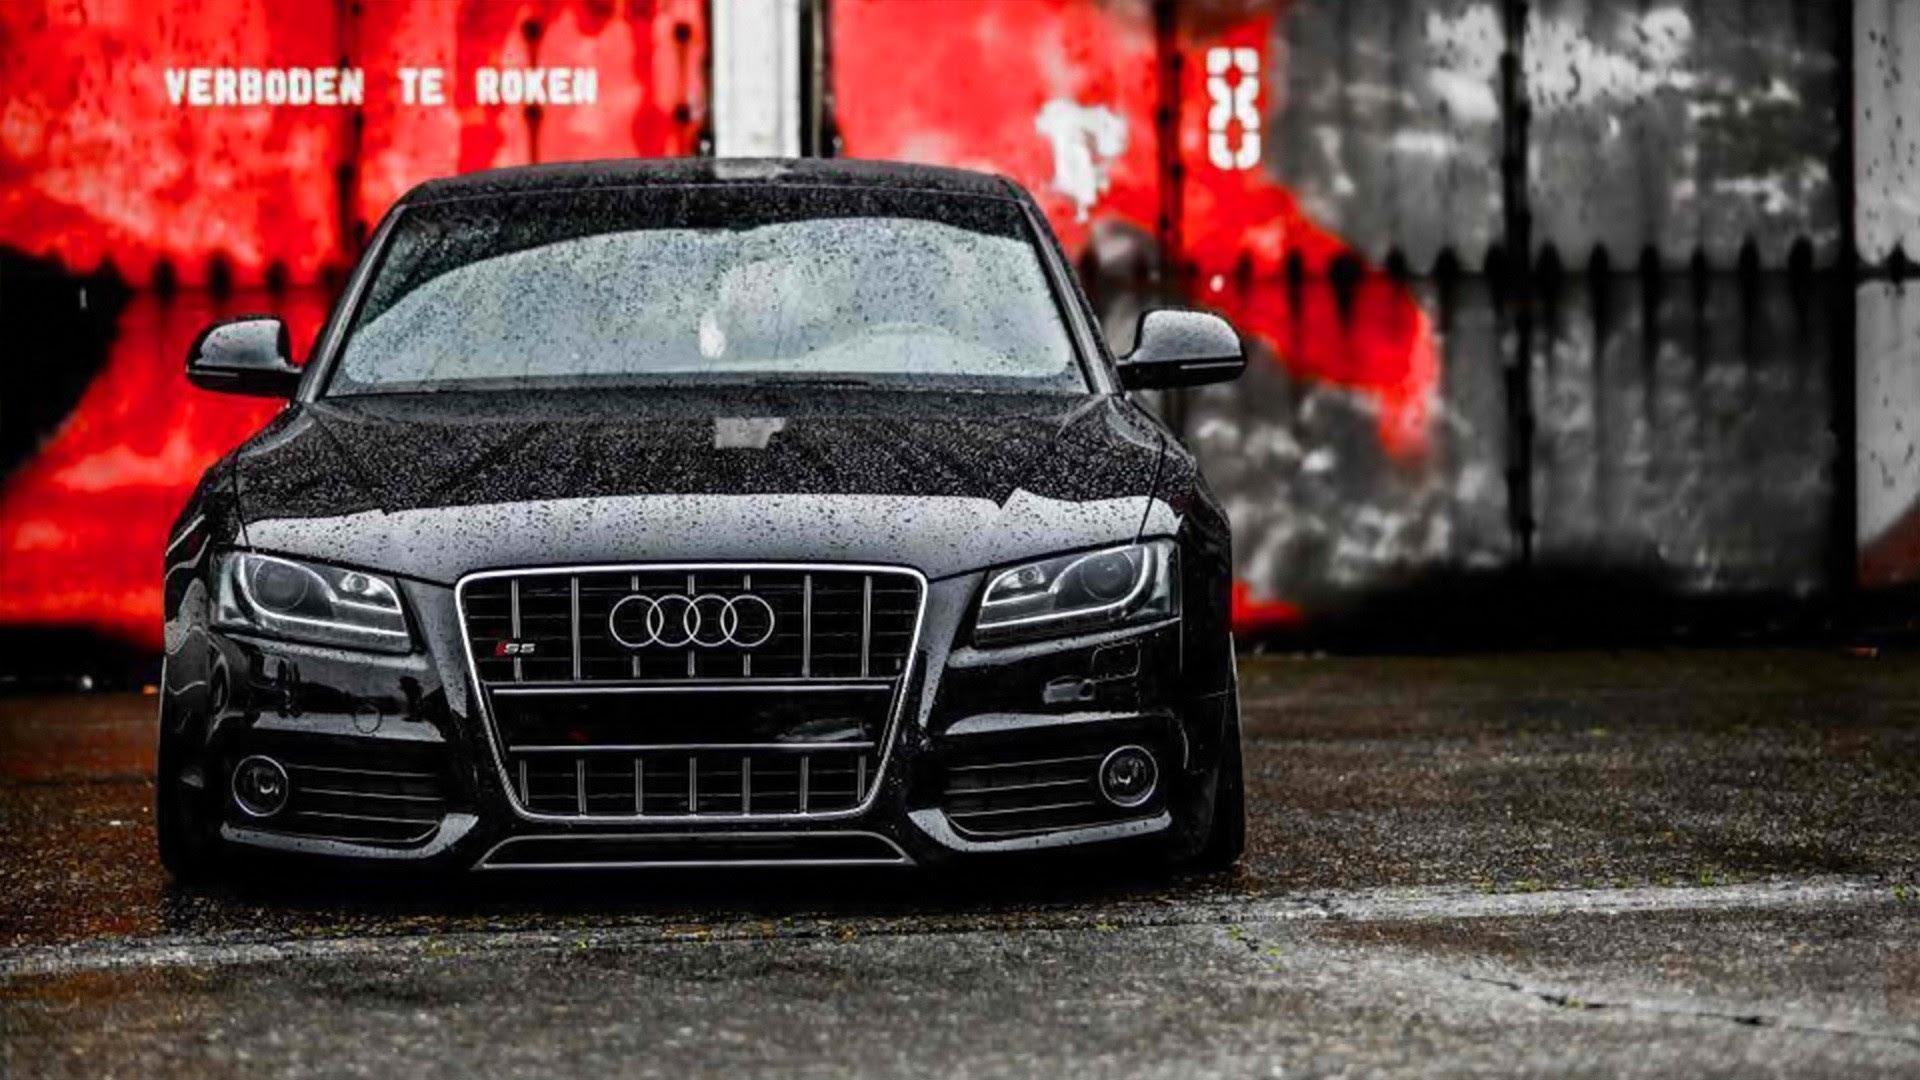 Amazing Audi Rs5 Wallpaper 1920x1080 15840